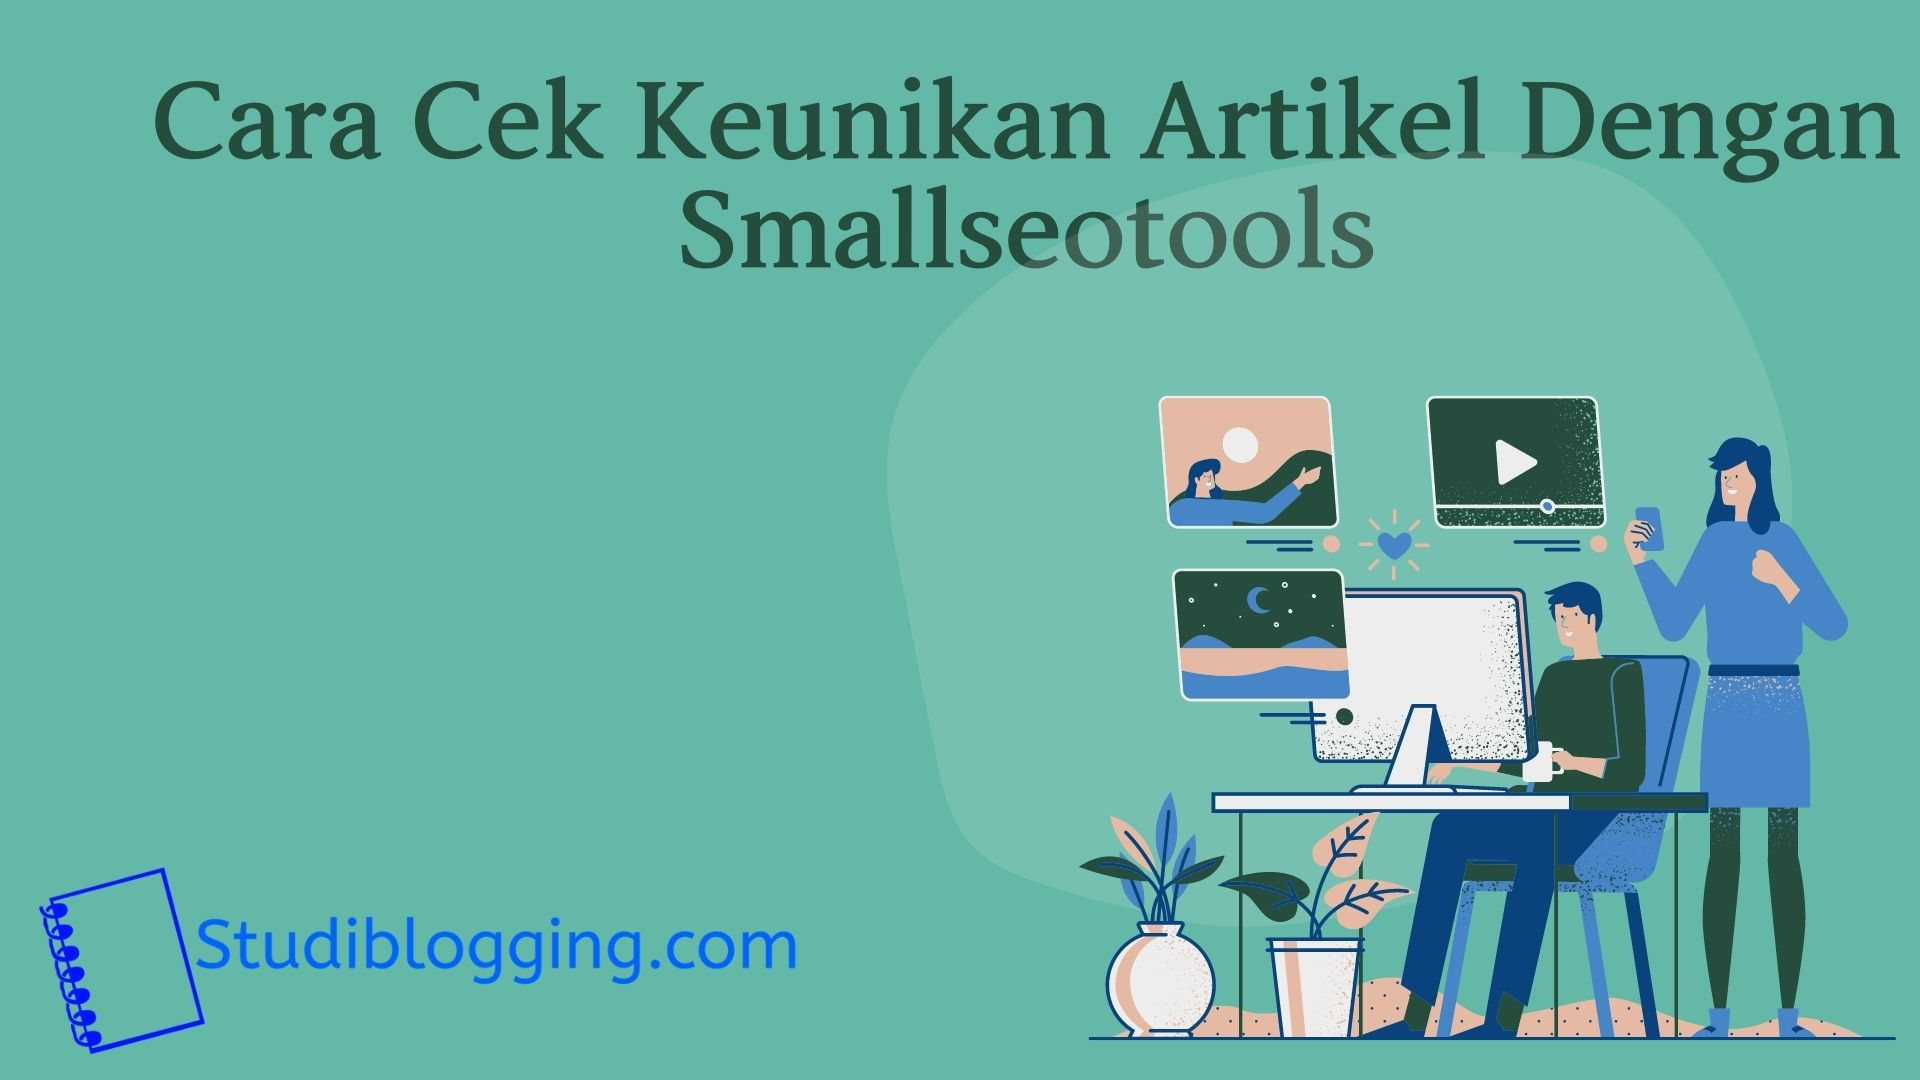 Cara Cek Keunikan Artikel Blog Dengan Smallseotools